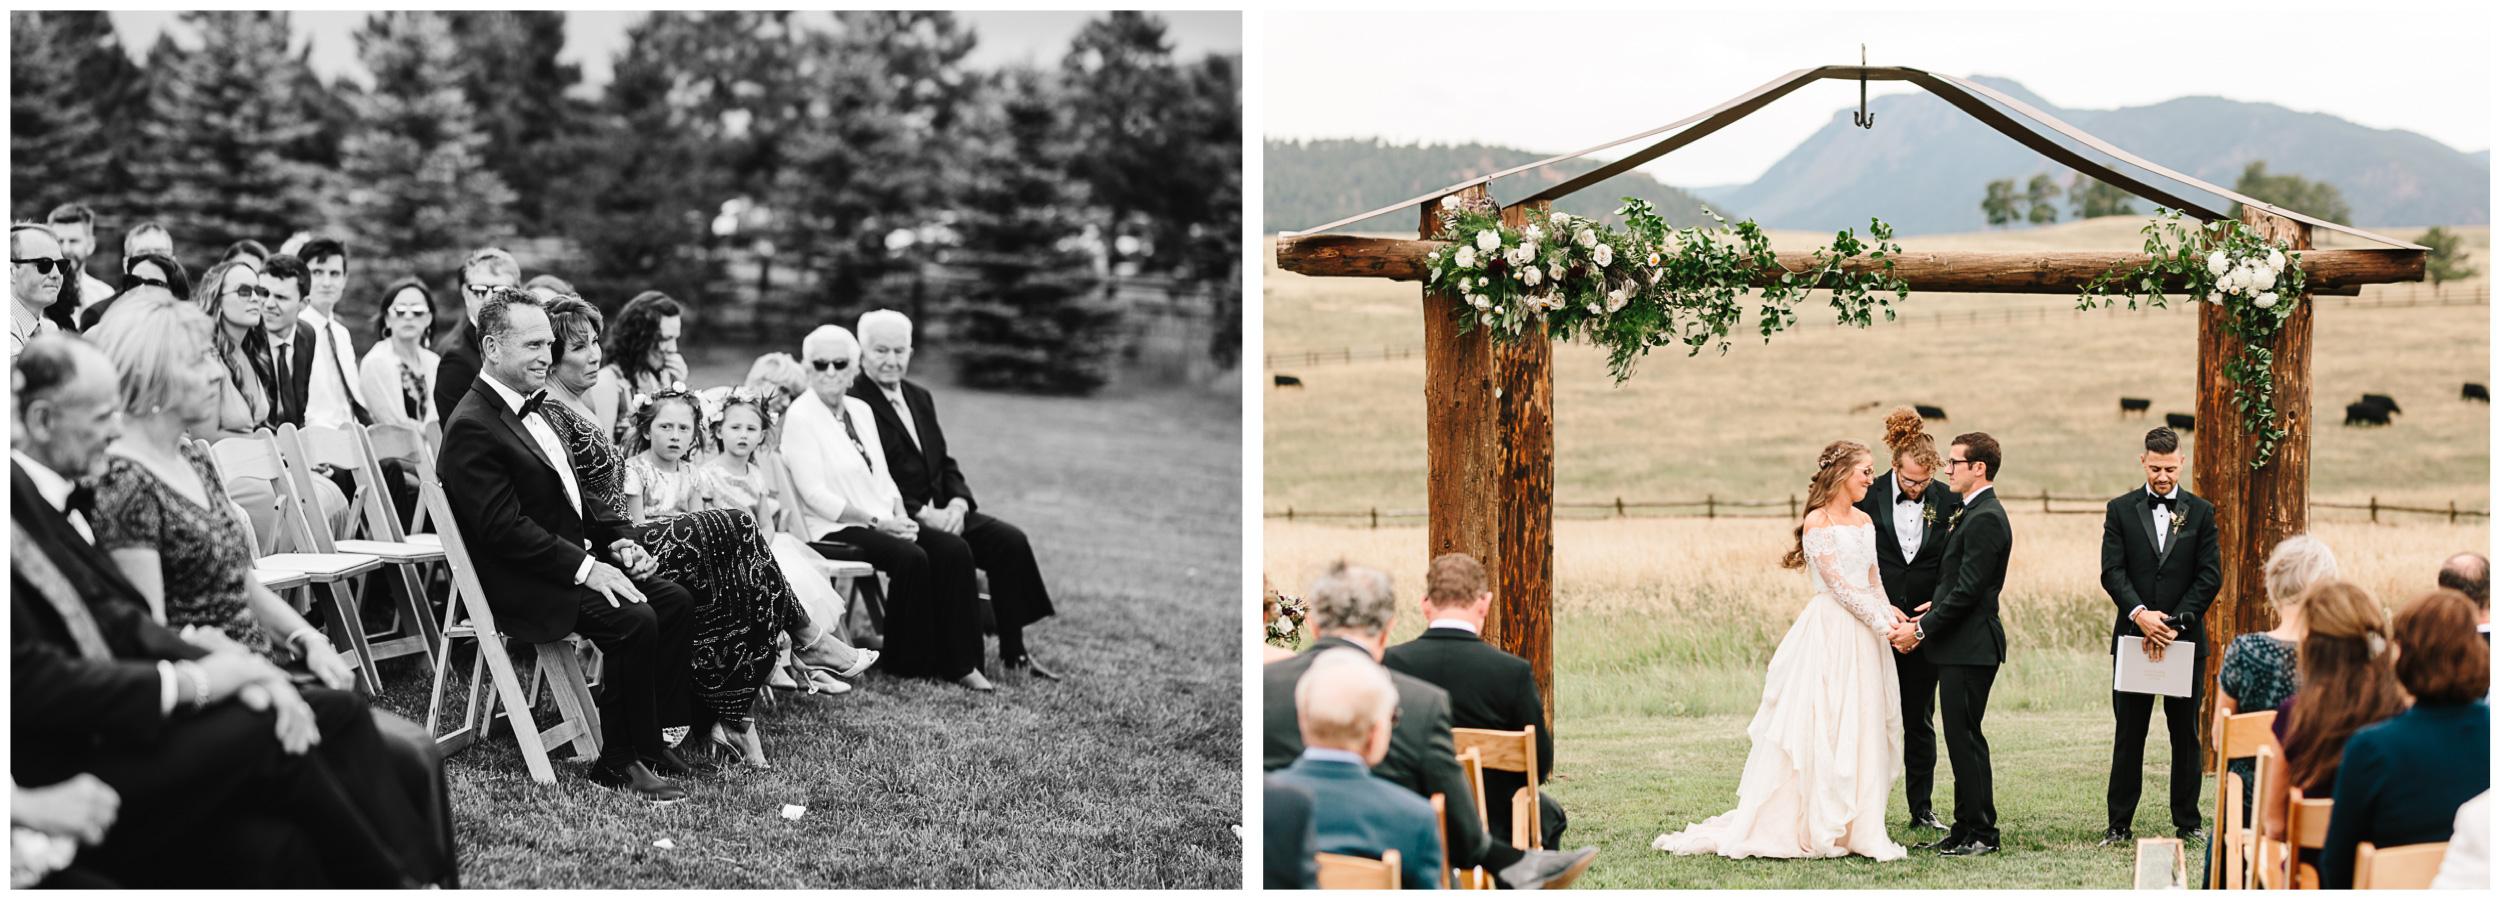 spruce_mountain_ranch_wedding_54.jpg